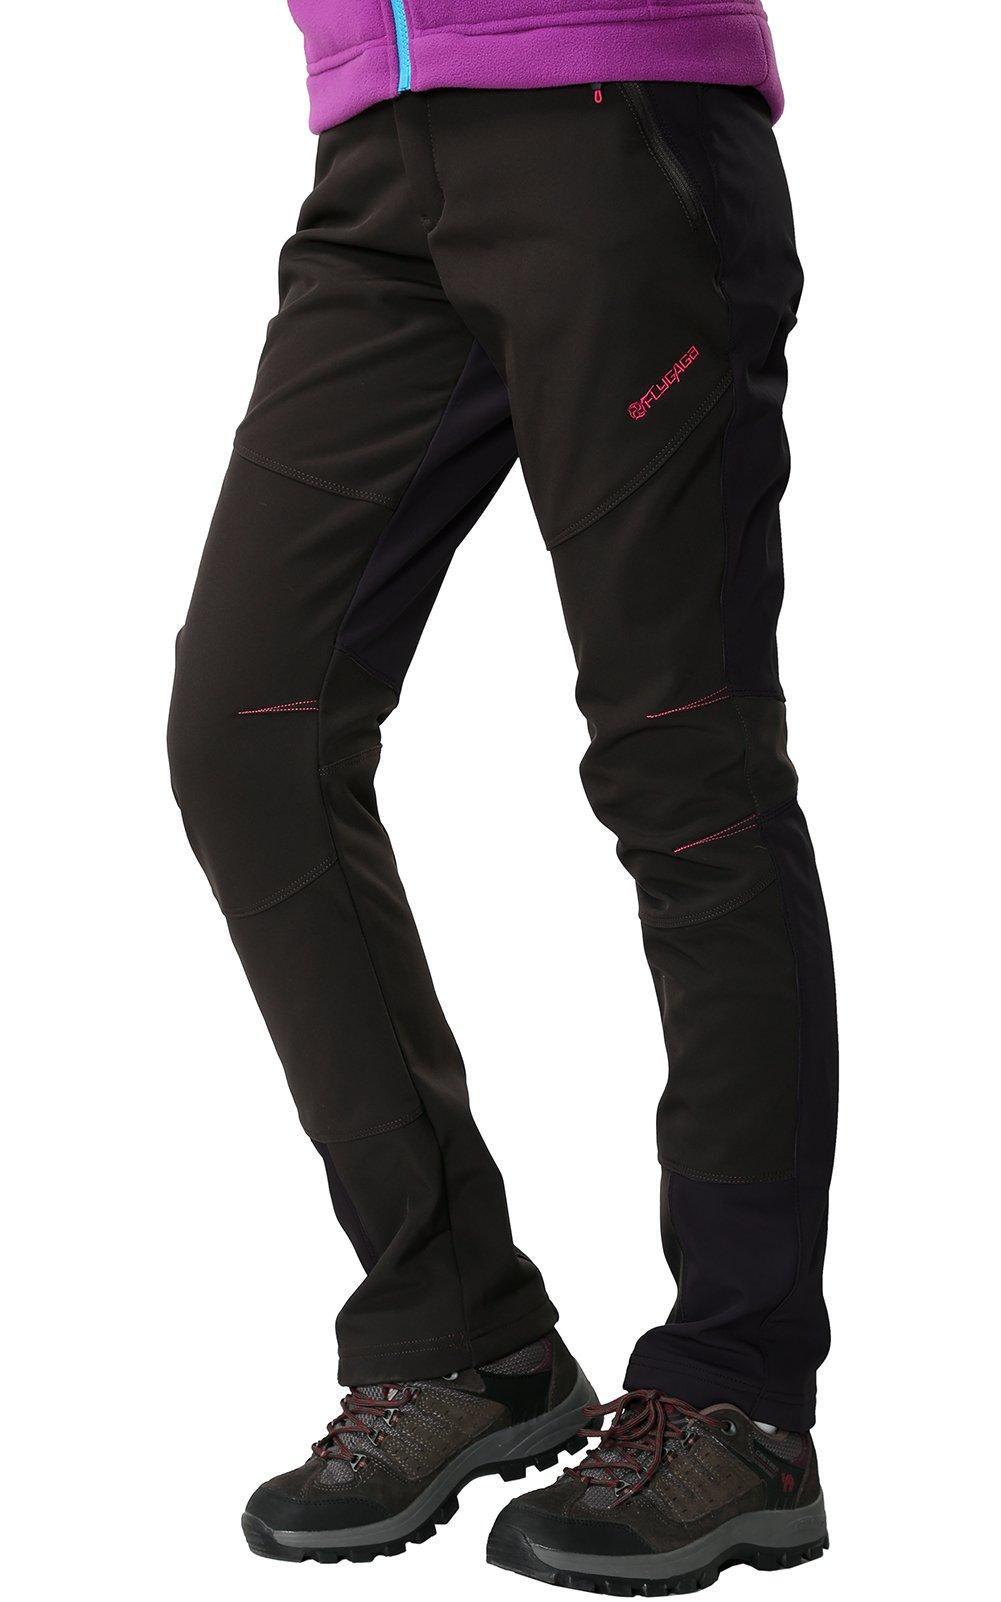 New York 8124d e6716 HAINES Pantaloni Trekking Donna Impermeabili Pantalone Softshell Pantaloni  Montagna Abbigliamento Escursionismo Invernali - FACESHOPPING